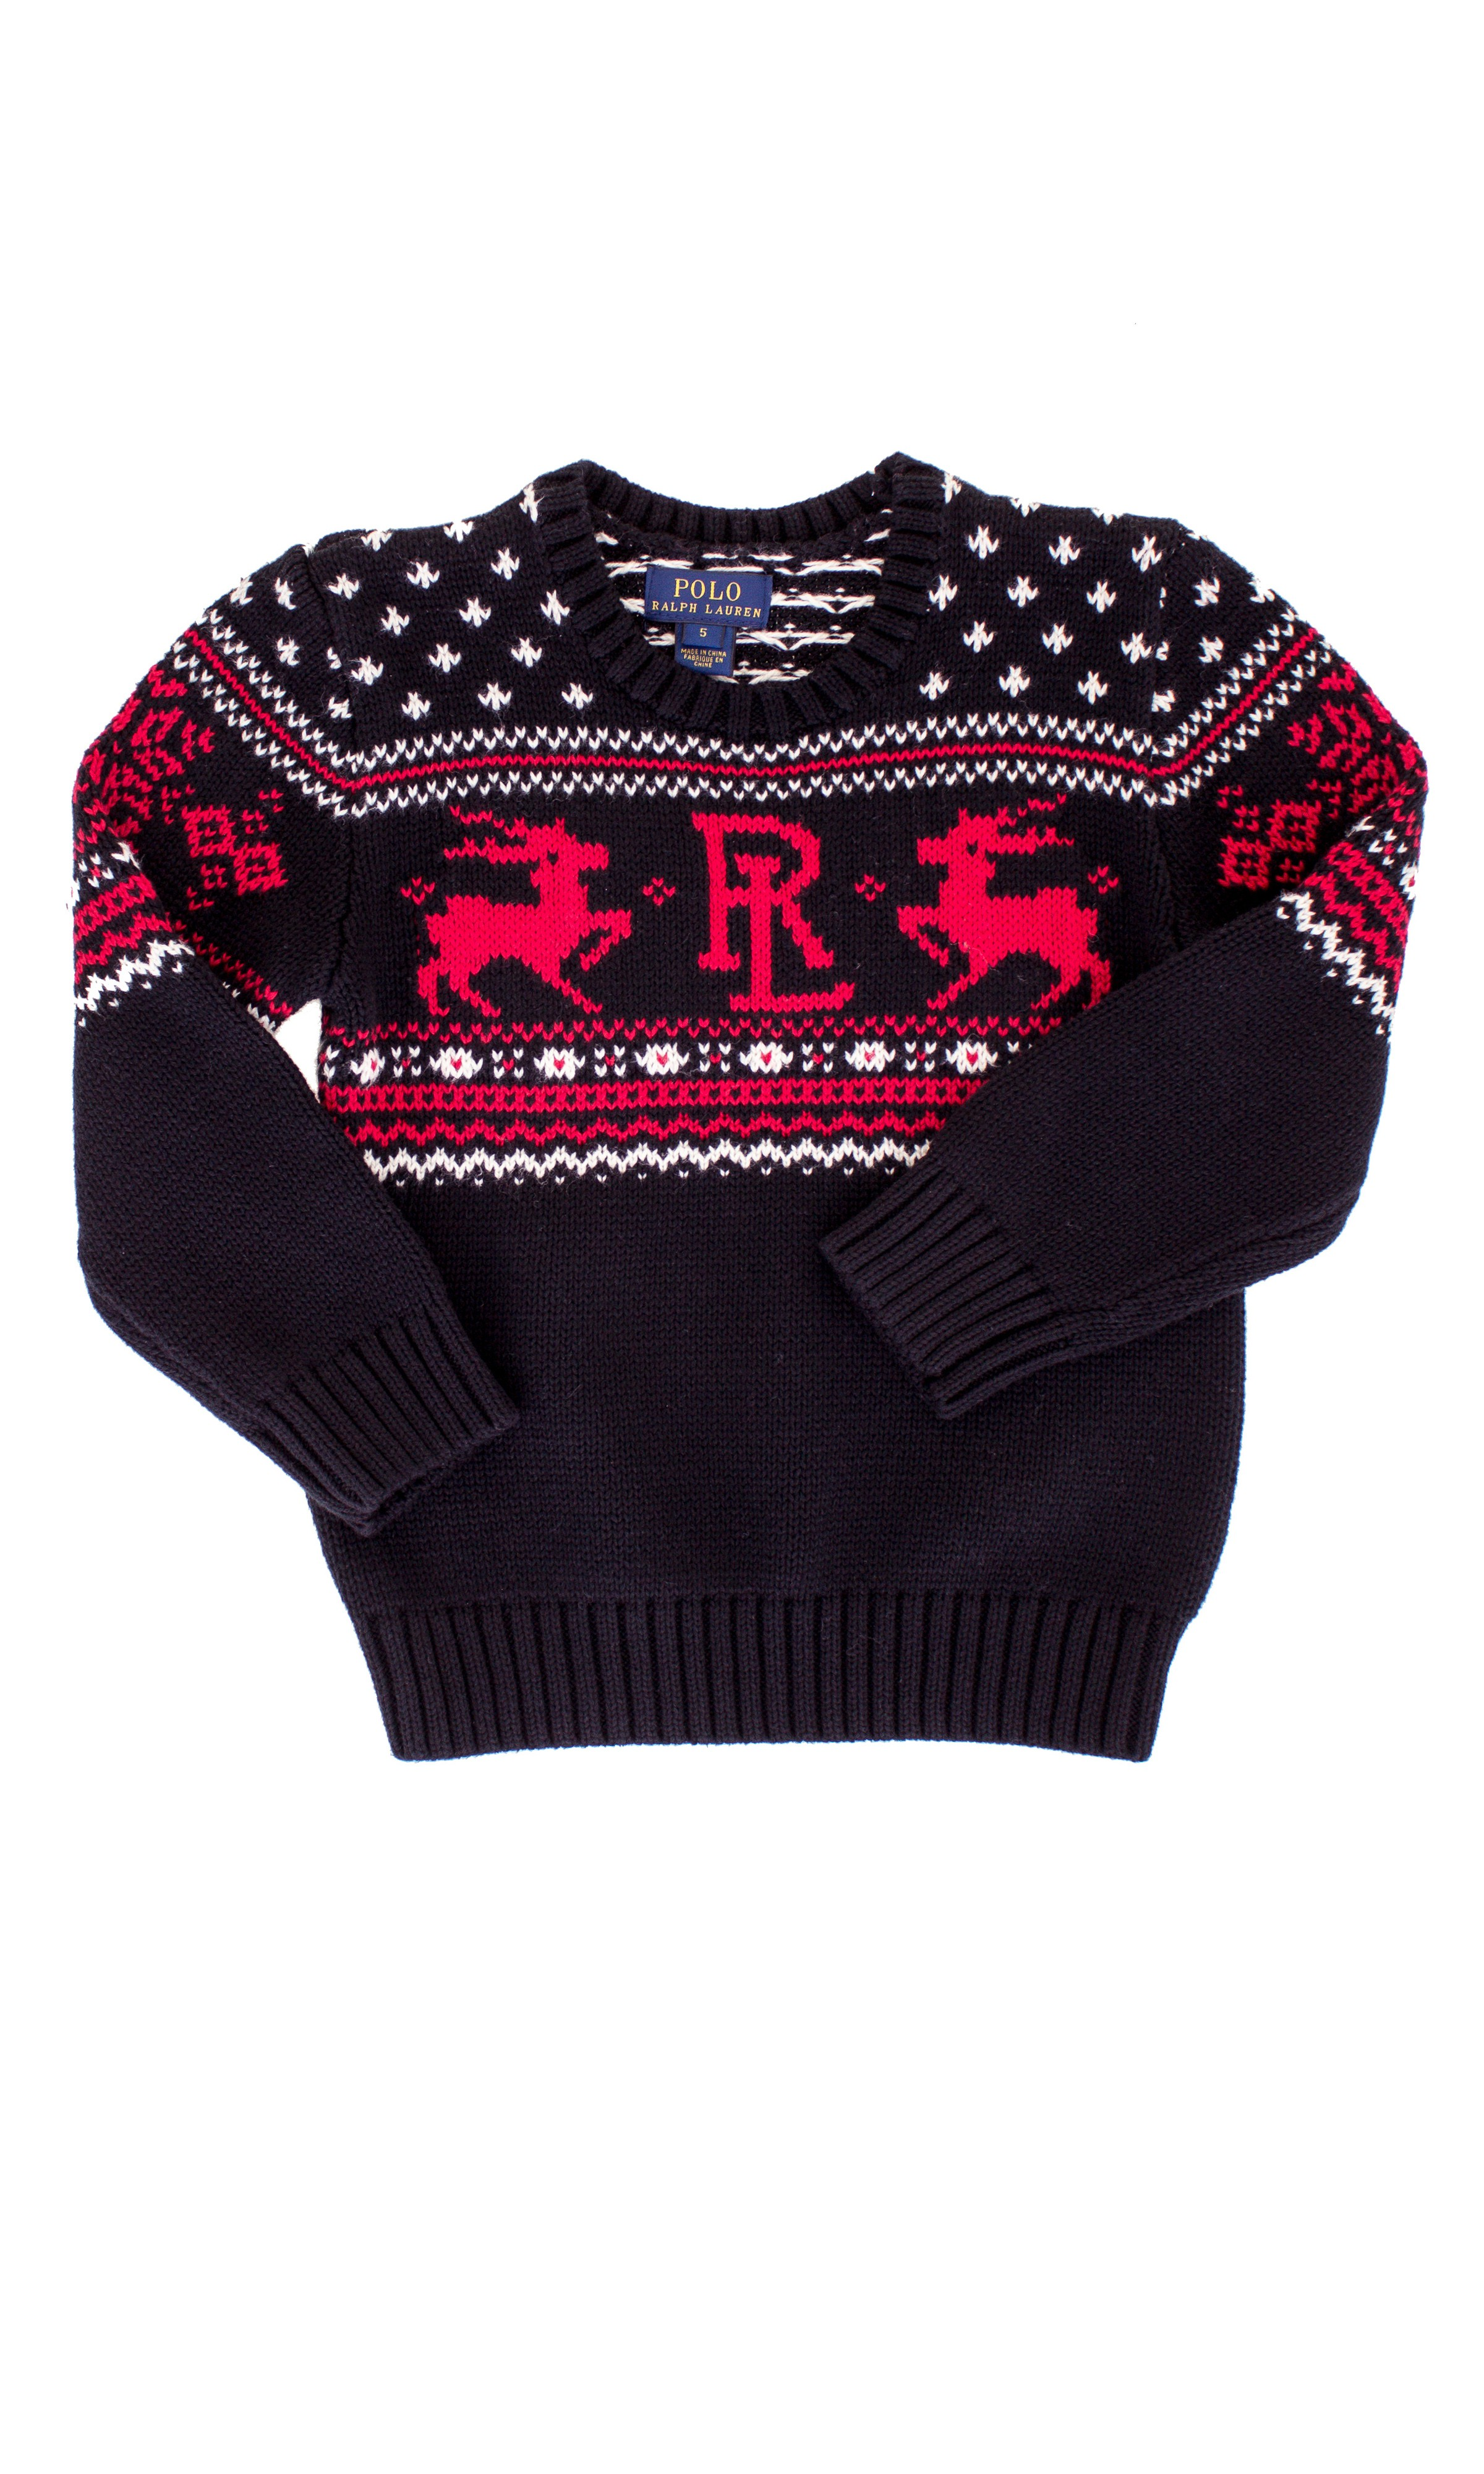 polo ralph lauren christmas sweater